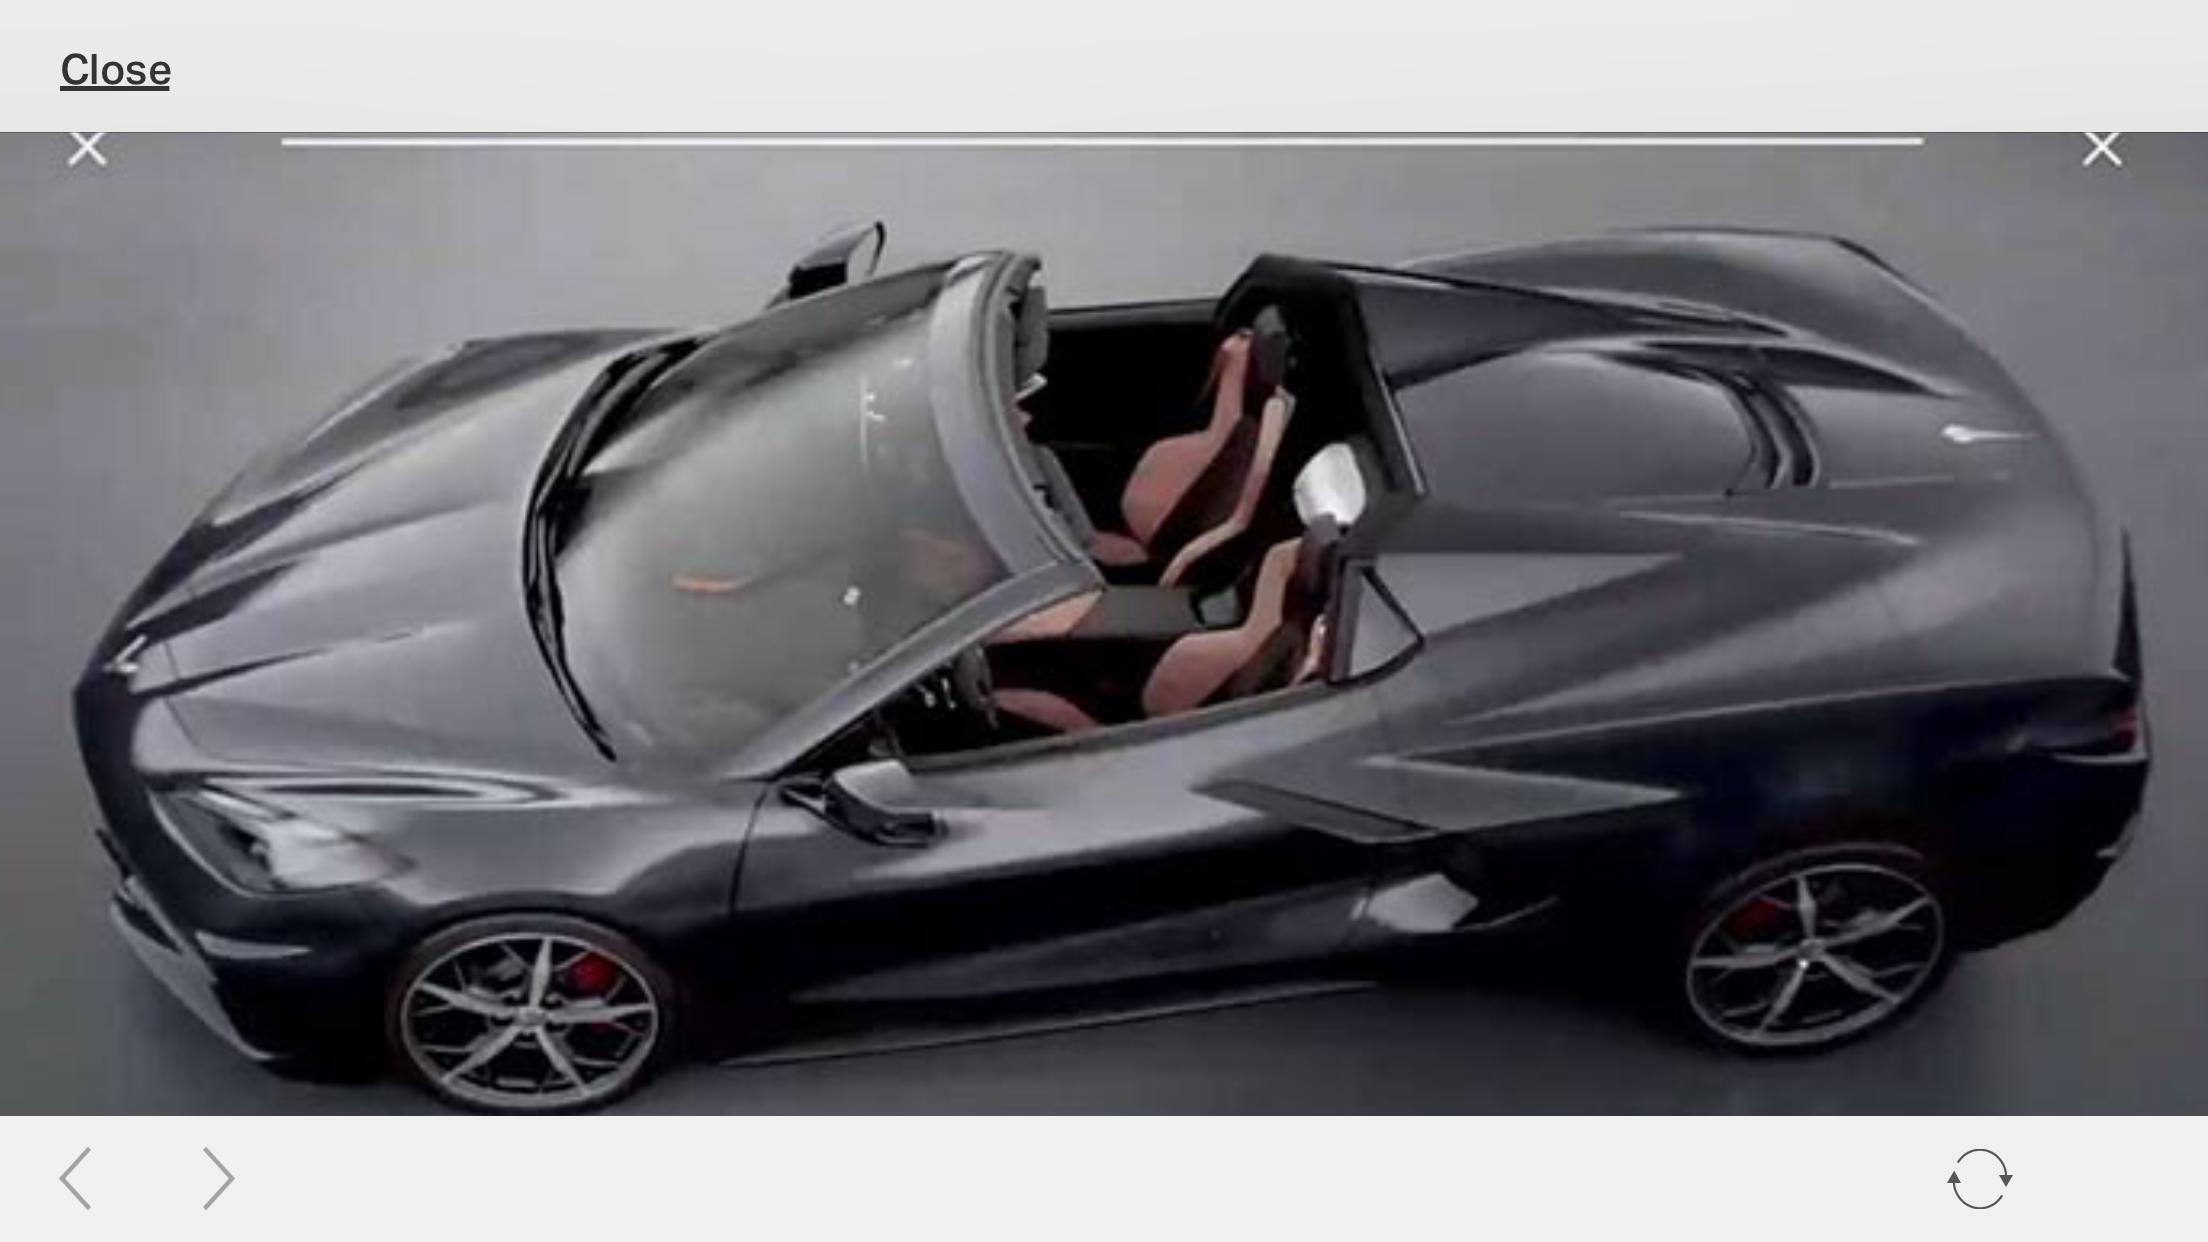 Pin By Andra C S Lizama On Cool Autos Corvette Convertible Chevy Corvette Chevrolet Corvette